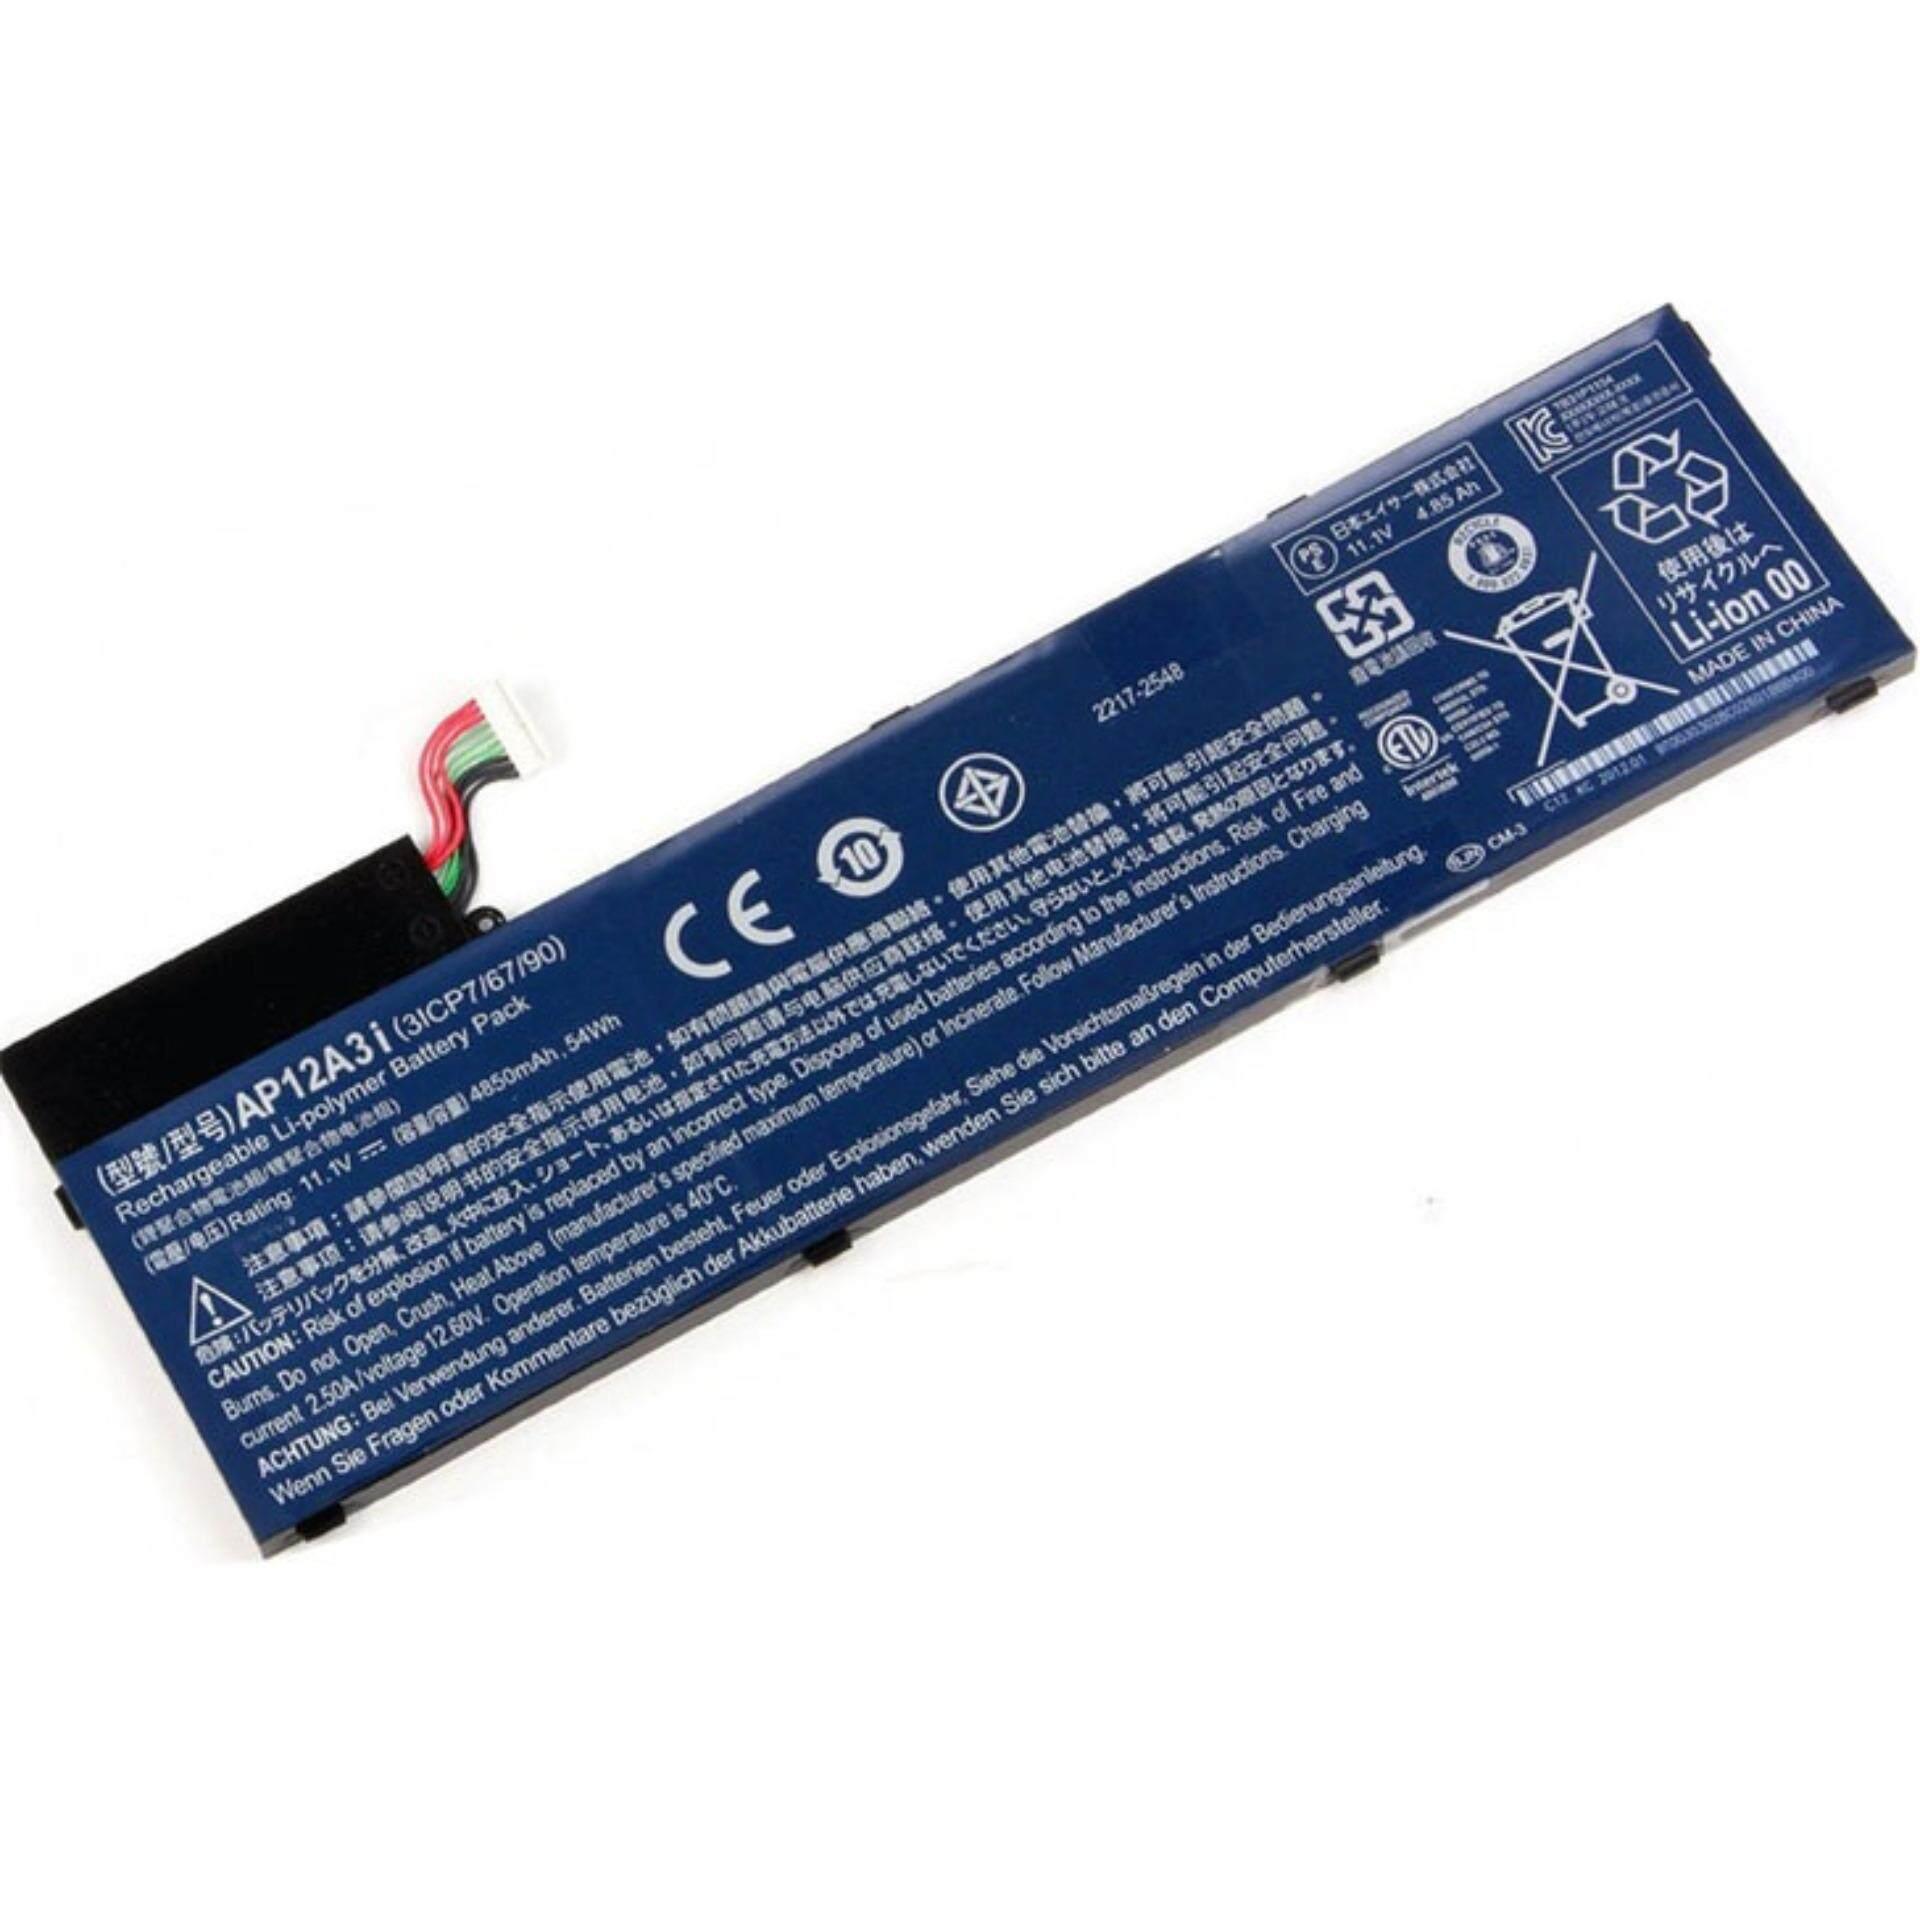 Acer Aspire M5-481 Laptop Battery